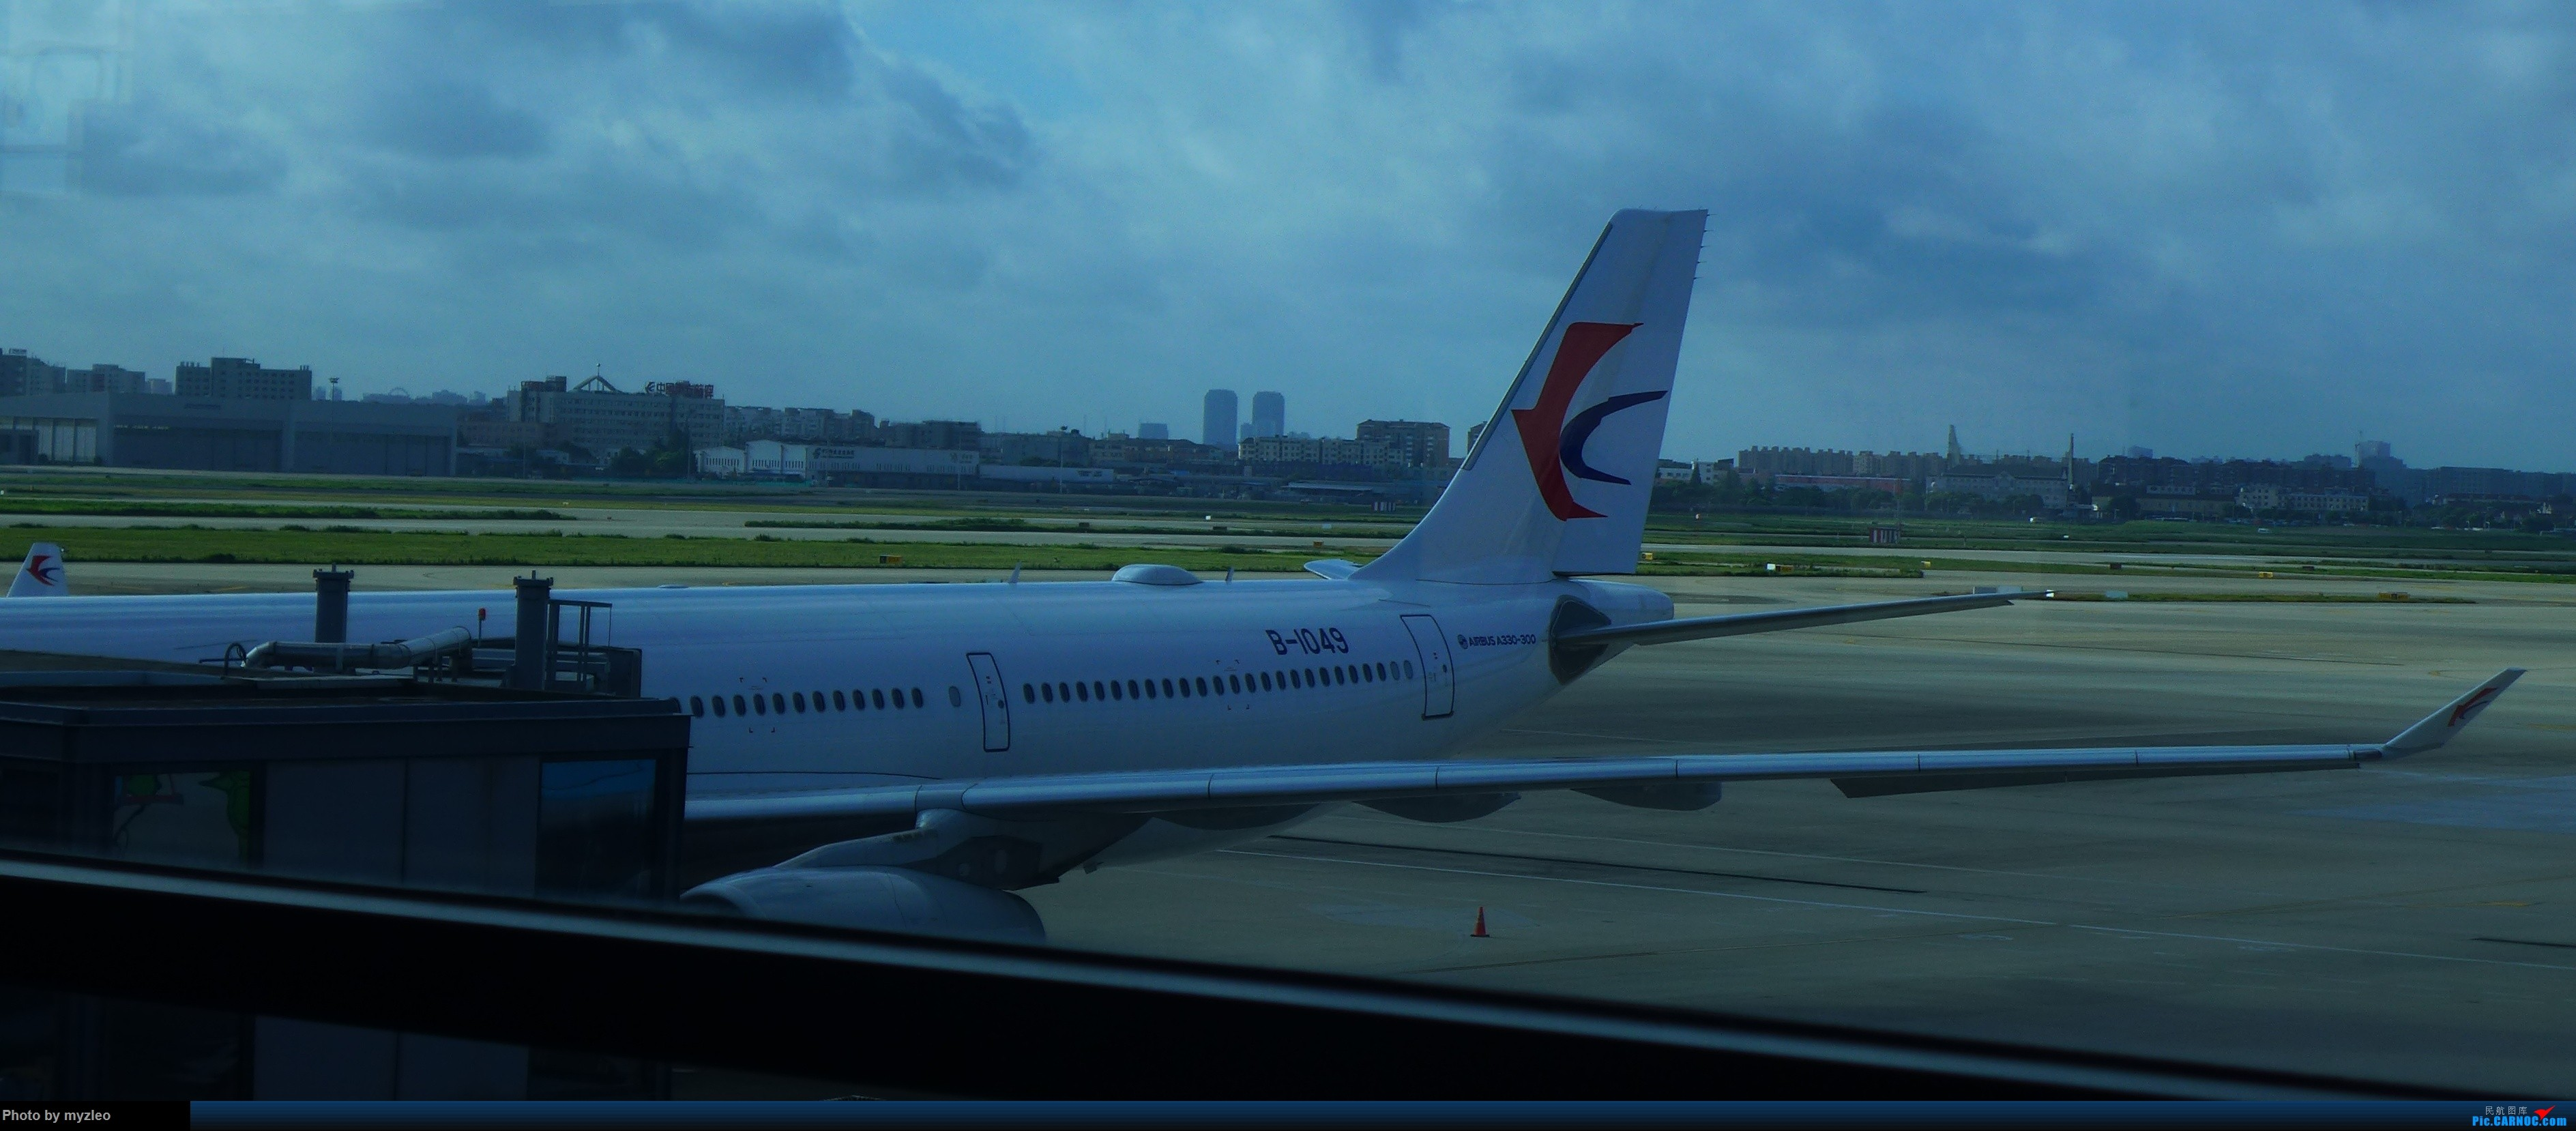 Re:[原创]【myzleo的游记2.1】昆洱风光(1)——SHA-KMG上航商务舱再体验+人在昆明 AIRBUS A330-300 B-1049 中国上海虹桥国际机场